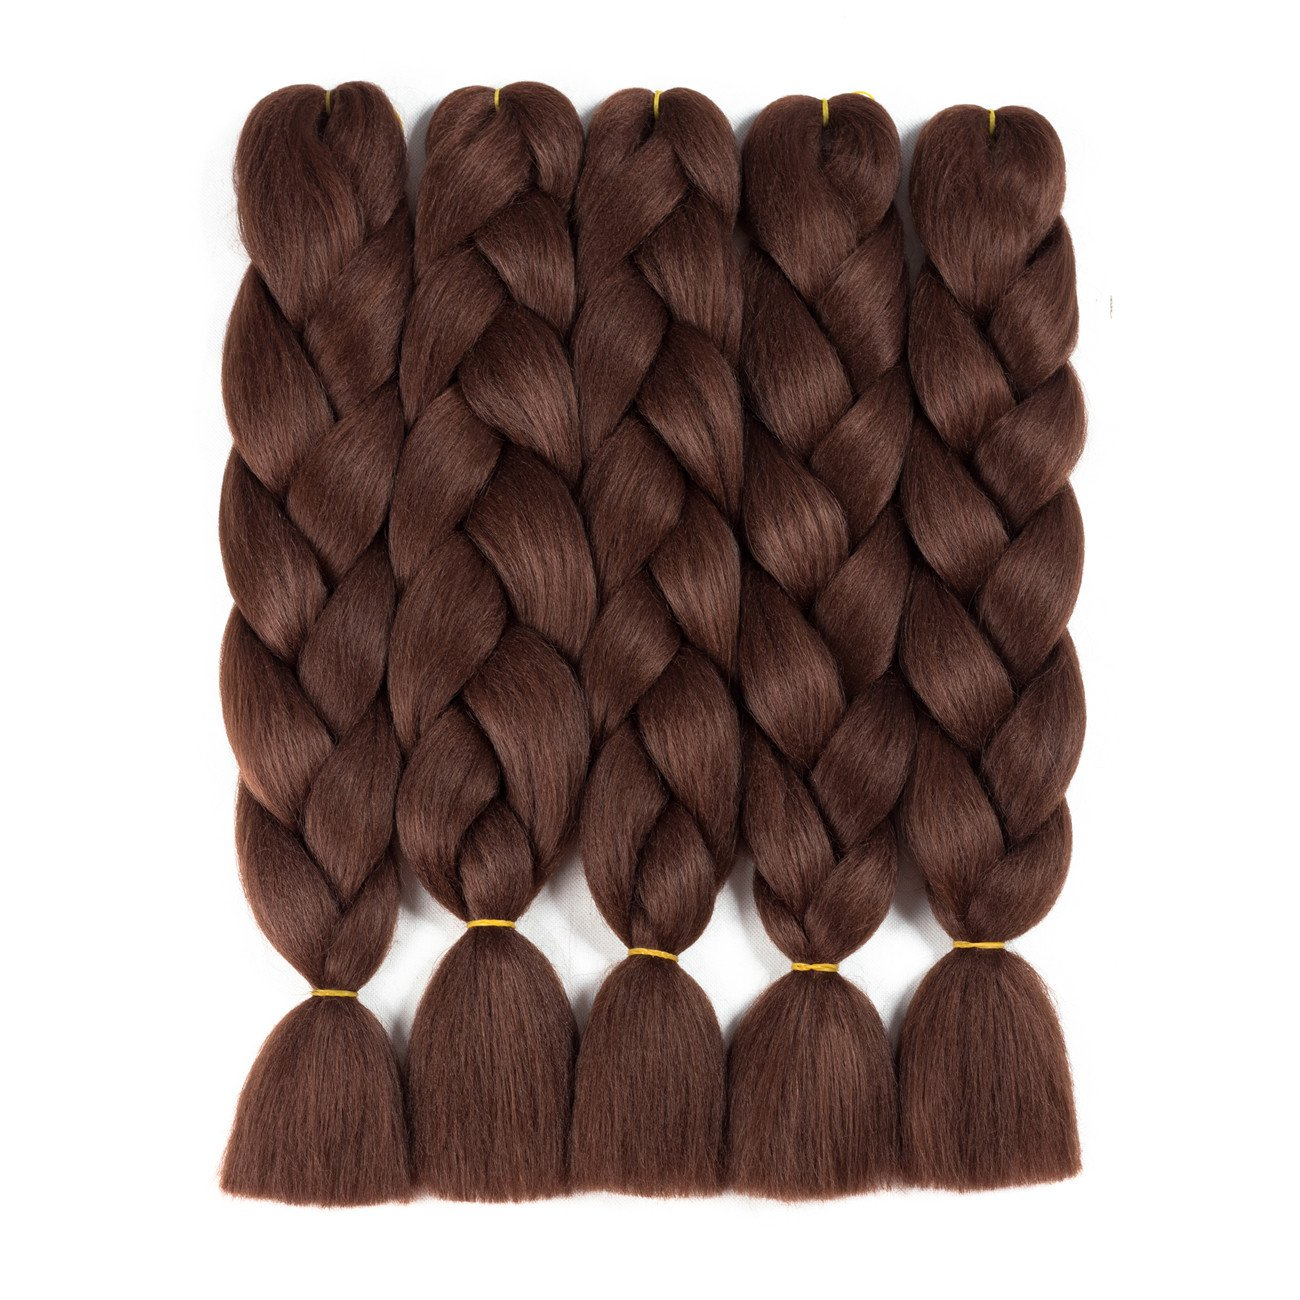 Alissa Jumbo Braiding Hair Extensions High Temperature Kanekalon Synthetic Ombre Twist Hair Multiple Tone Colored Jumbo Braiding Hair (24'', Black-Blue-Azure)